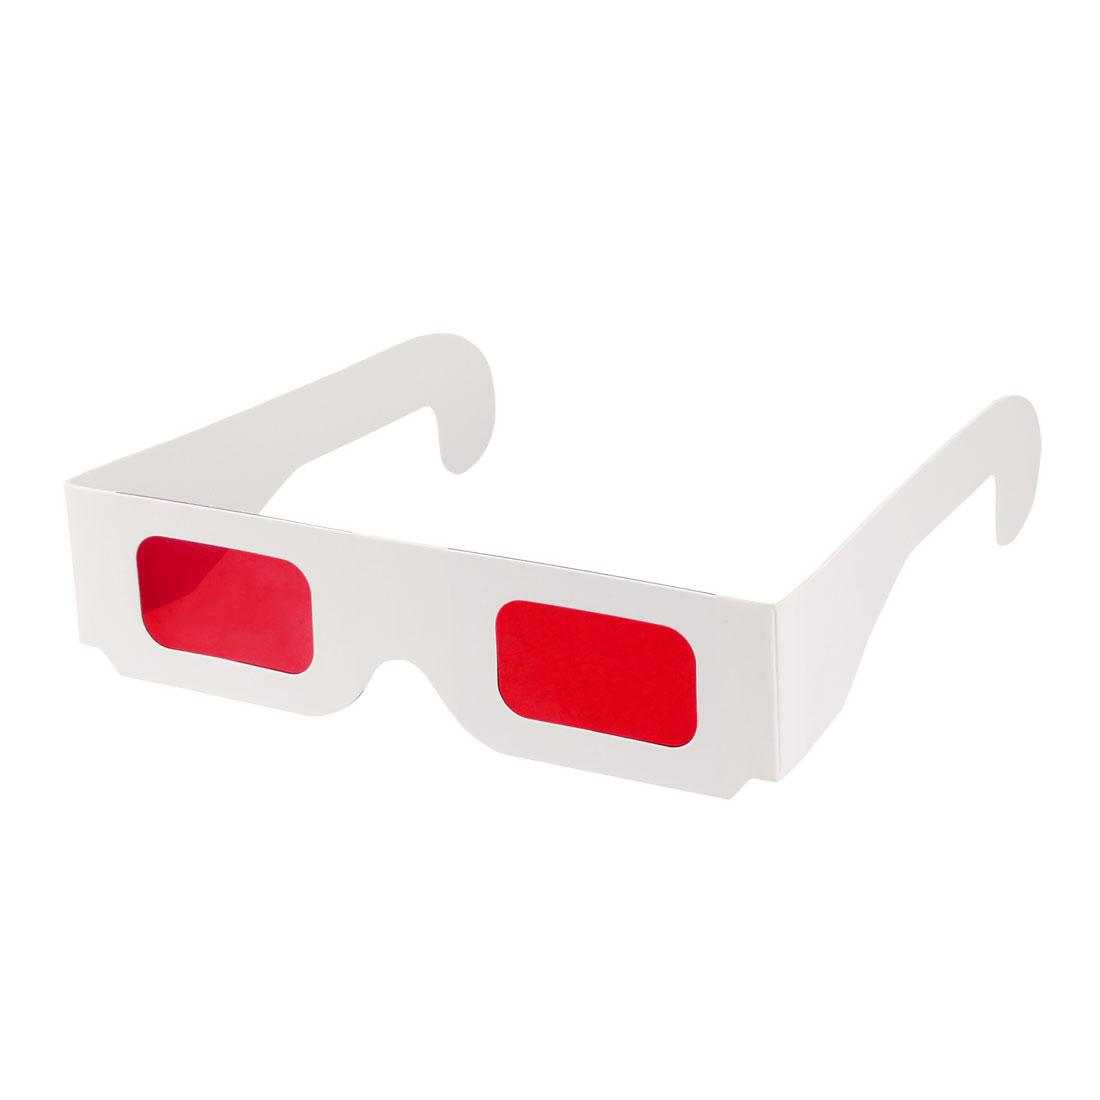 Secret Decoder Glasses Red-Red Filters Lens White Foldable Frame 3D Glasses 5pcs